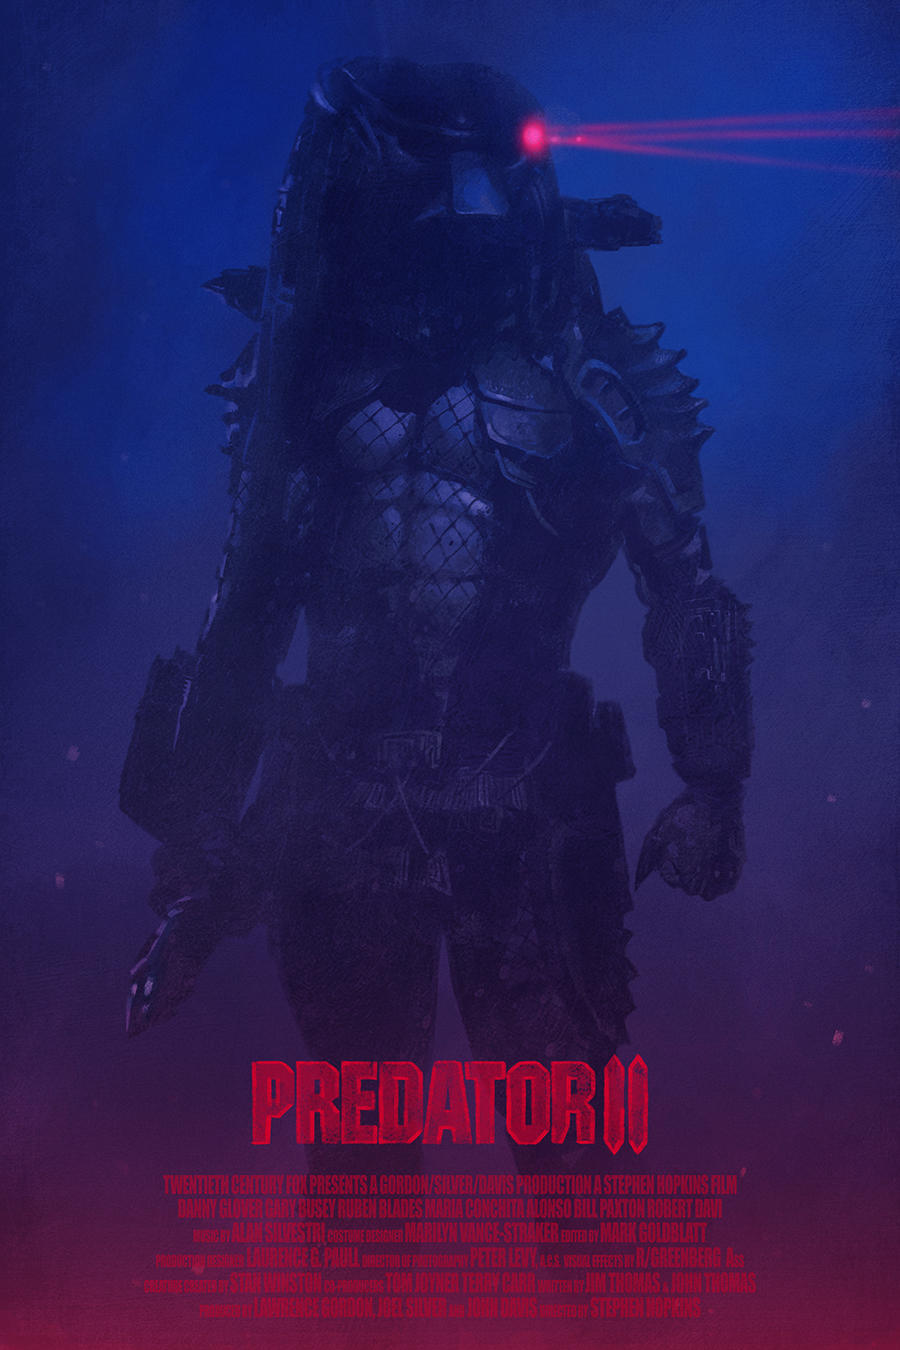 predator 2 movie poster by yvanquinet